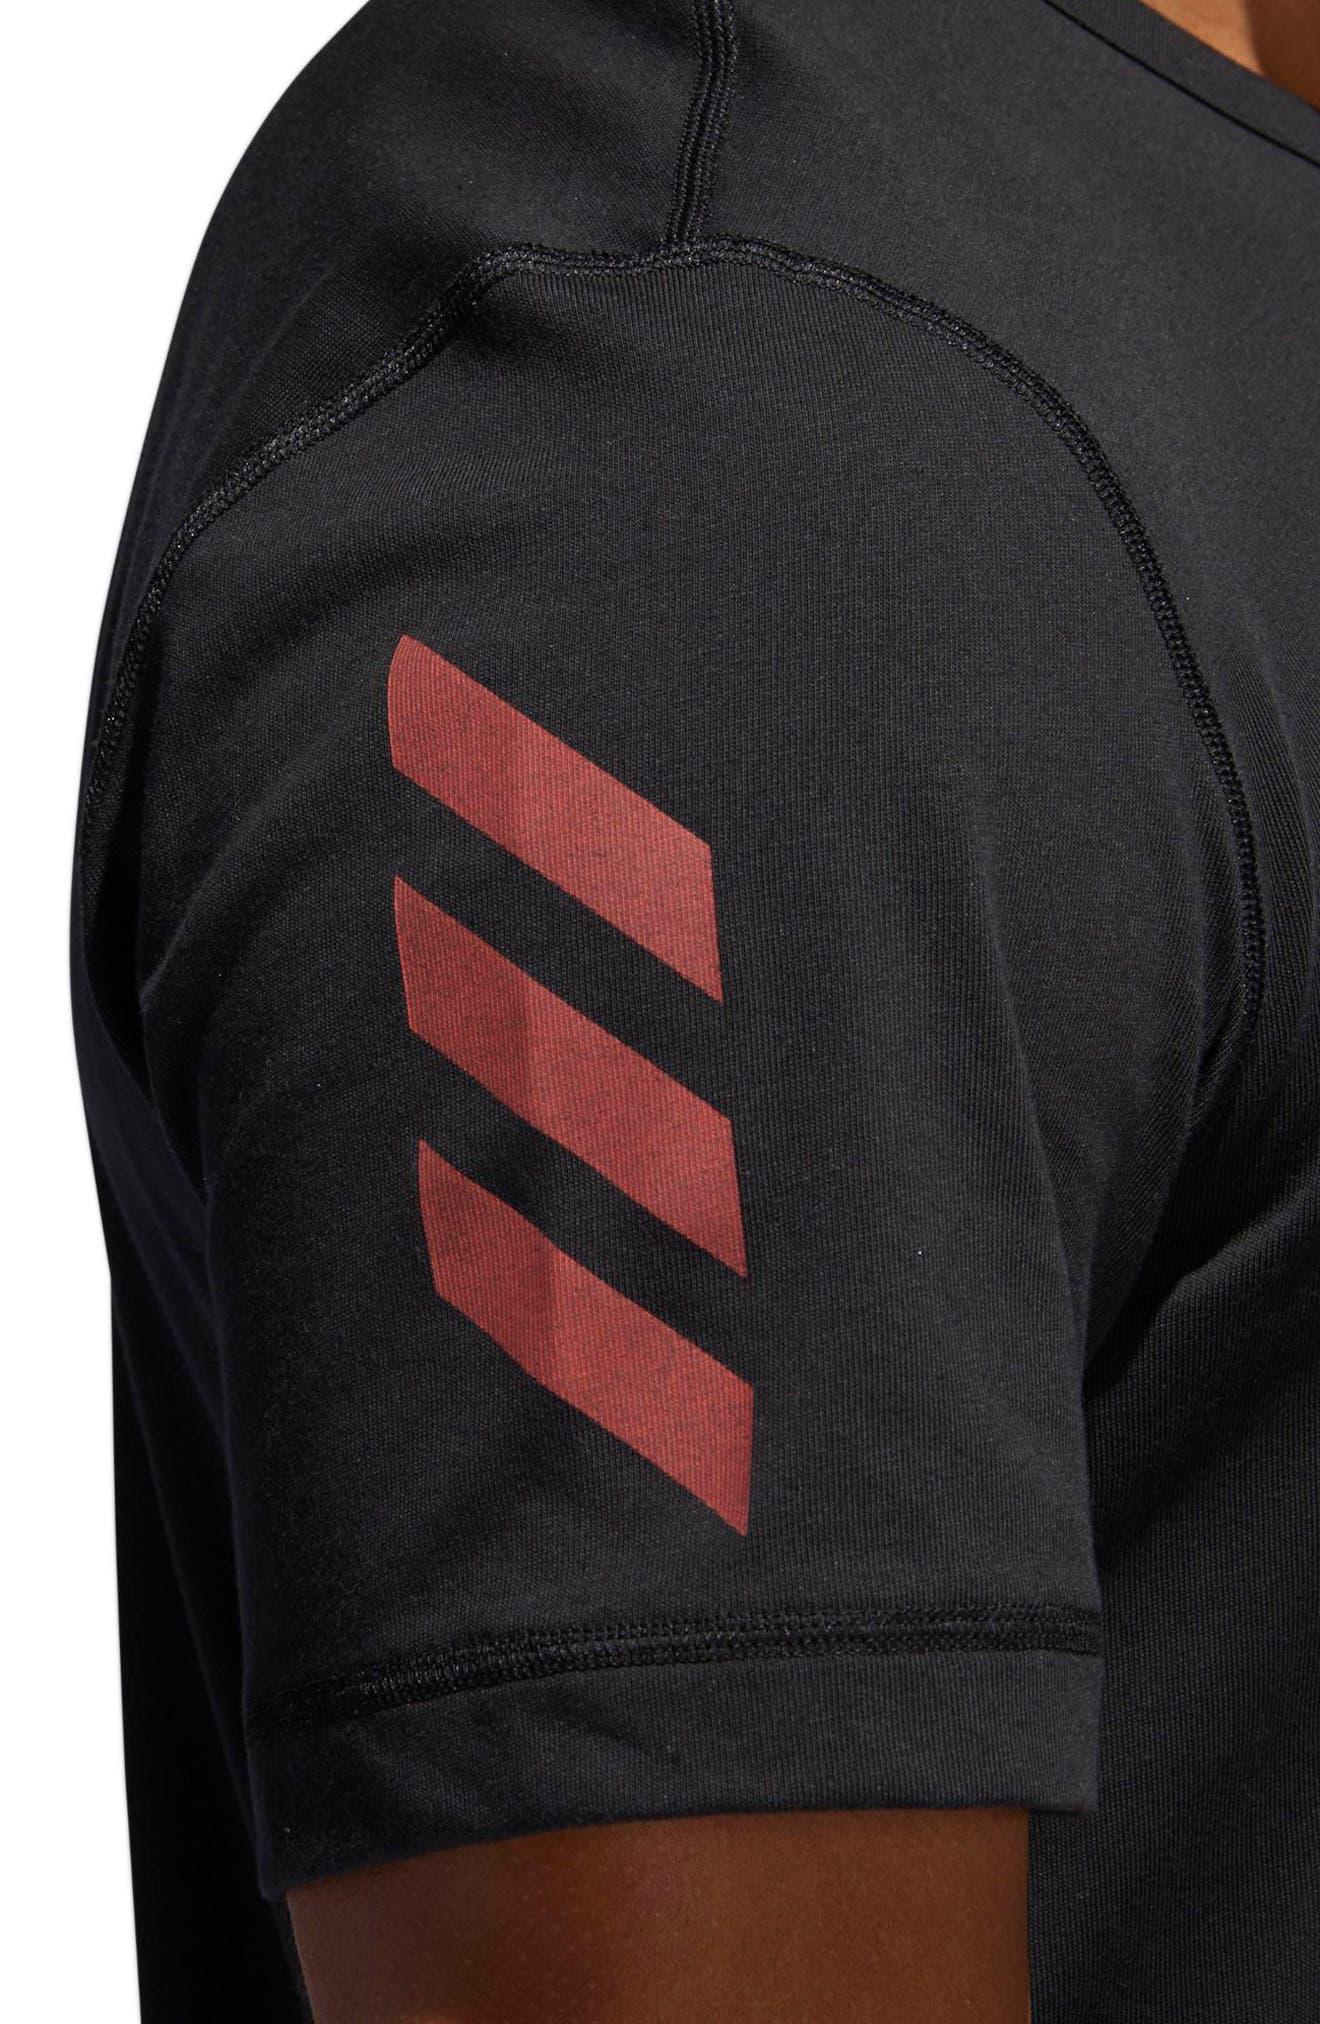 Harden Brand Slogan T-Shirt,                             Alternate thumbnail 4, color,                             001